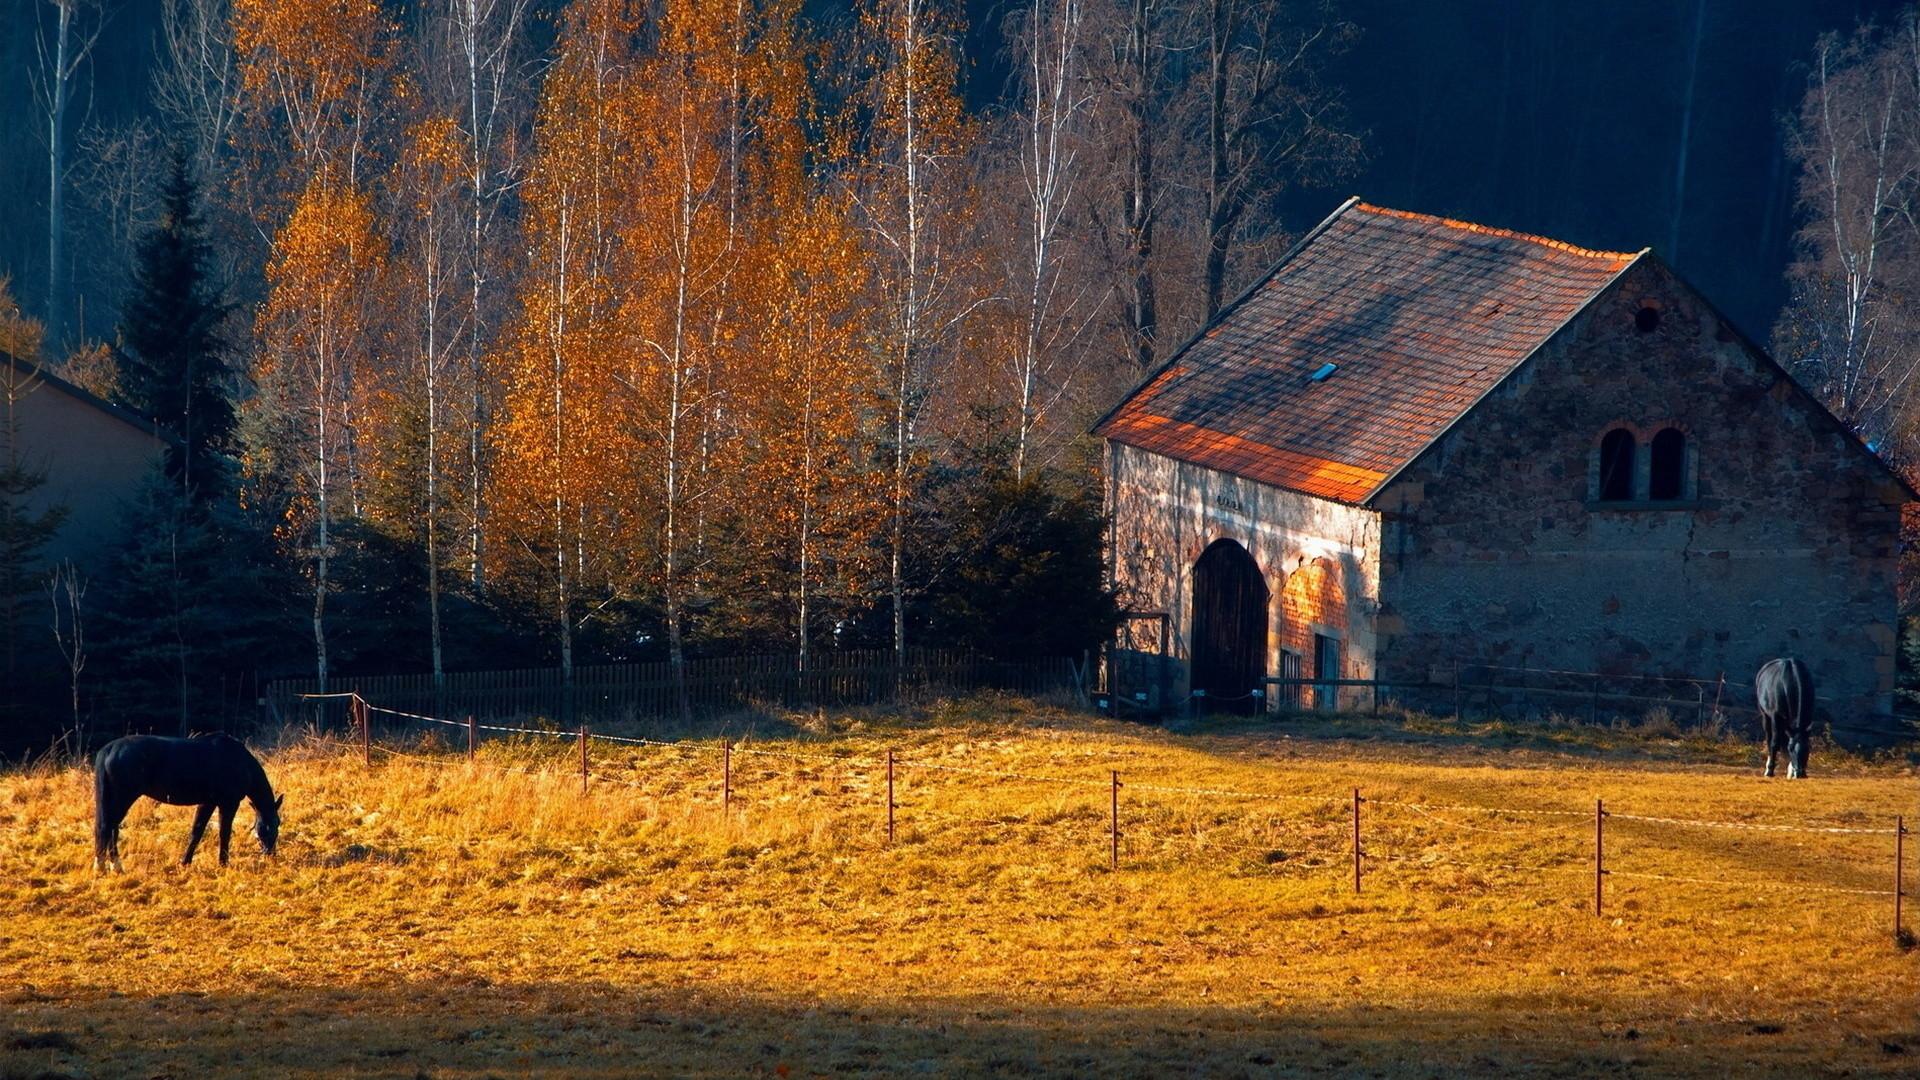 Horses rustic farm barn landscapes buildings autumn fall trees wallpaper |  | 31714 | WallpaperUP